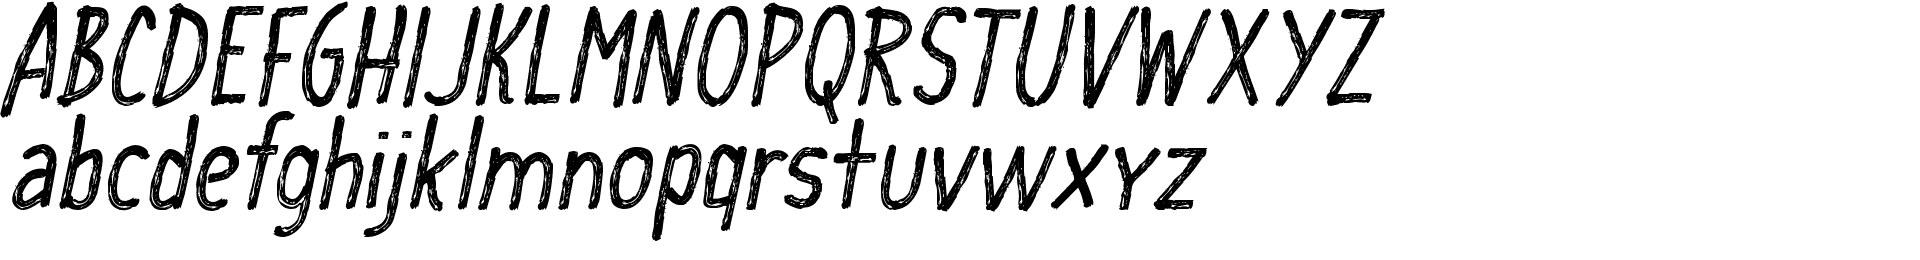 CF School Handwriting